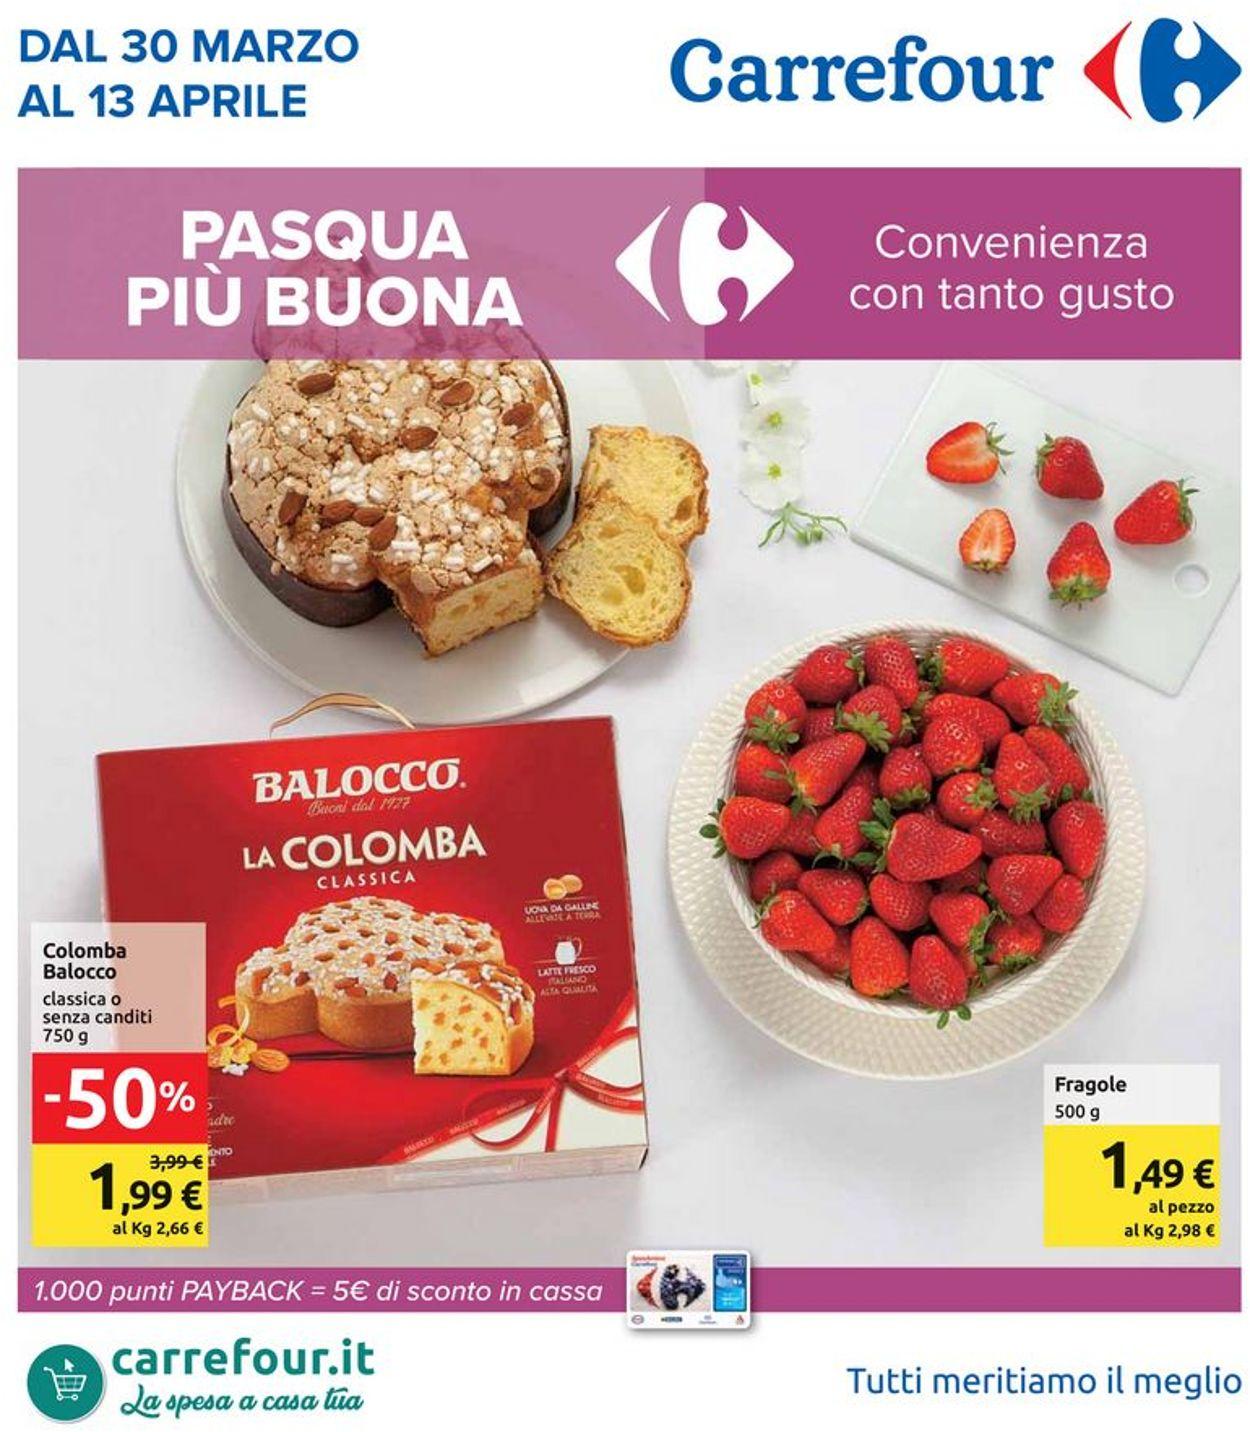 Volantino Carrefour - Offerte 30/03-13/04/2020